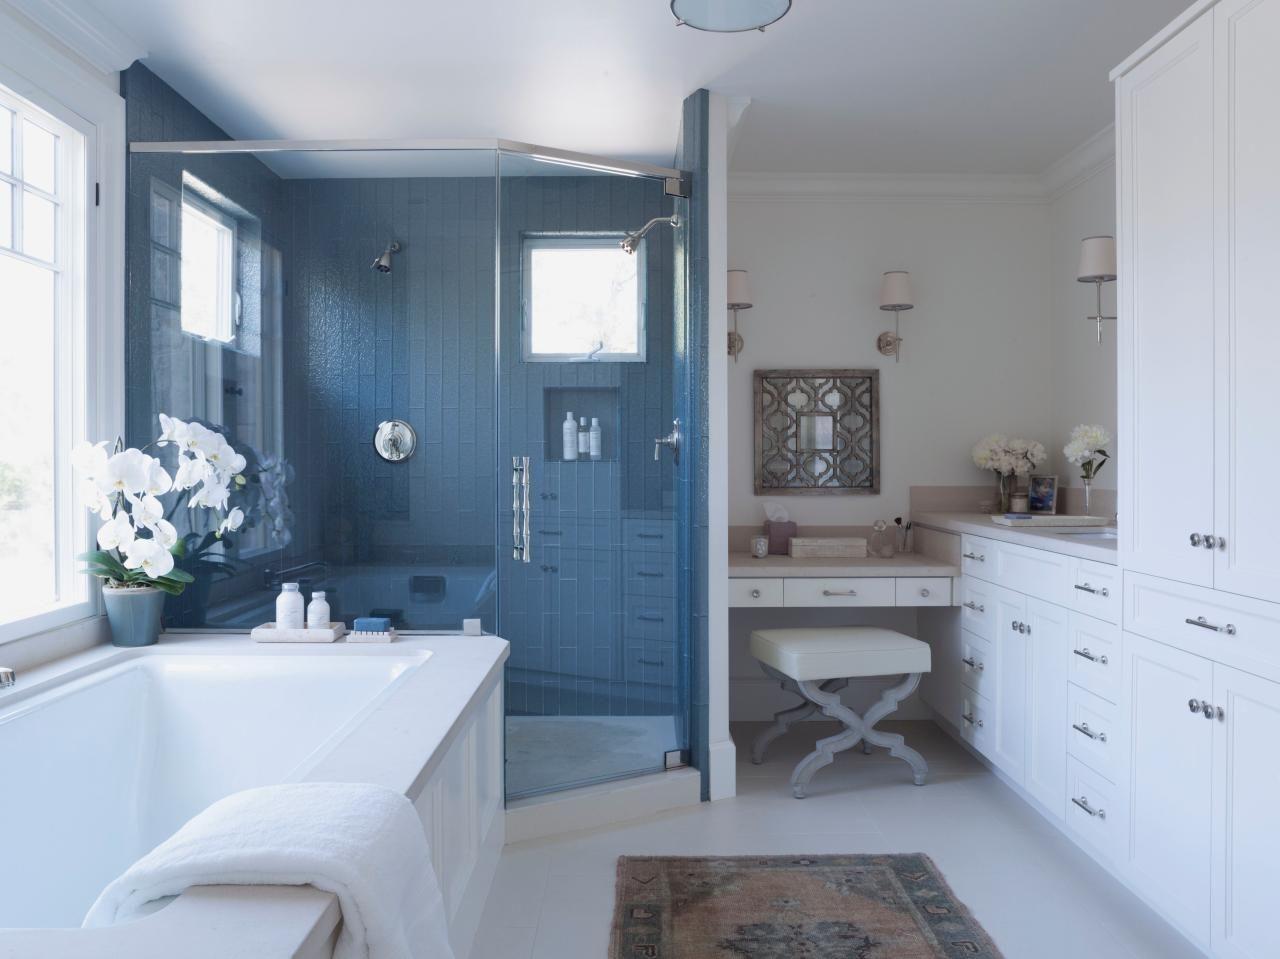 Diy Bathroom Remodel Ideas For Average People   Diy Bathroom Remodel ...